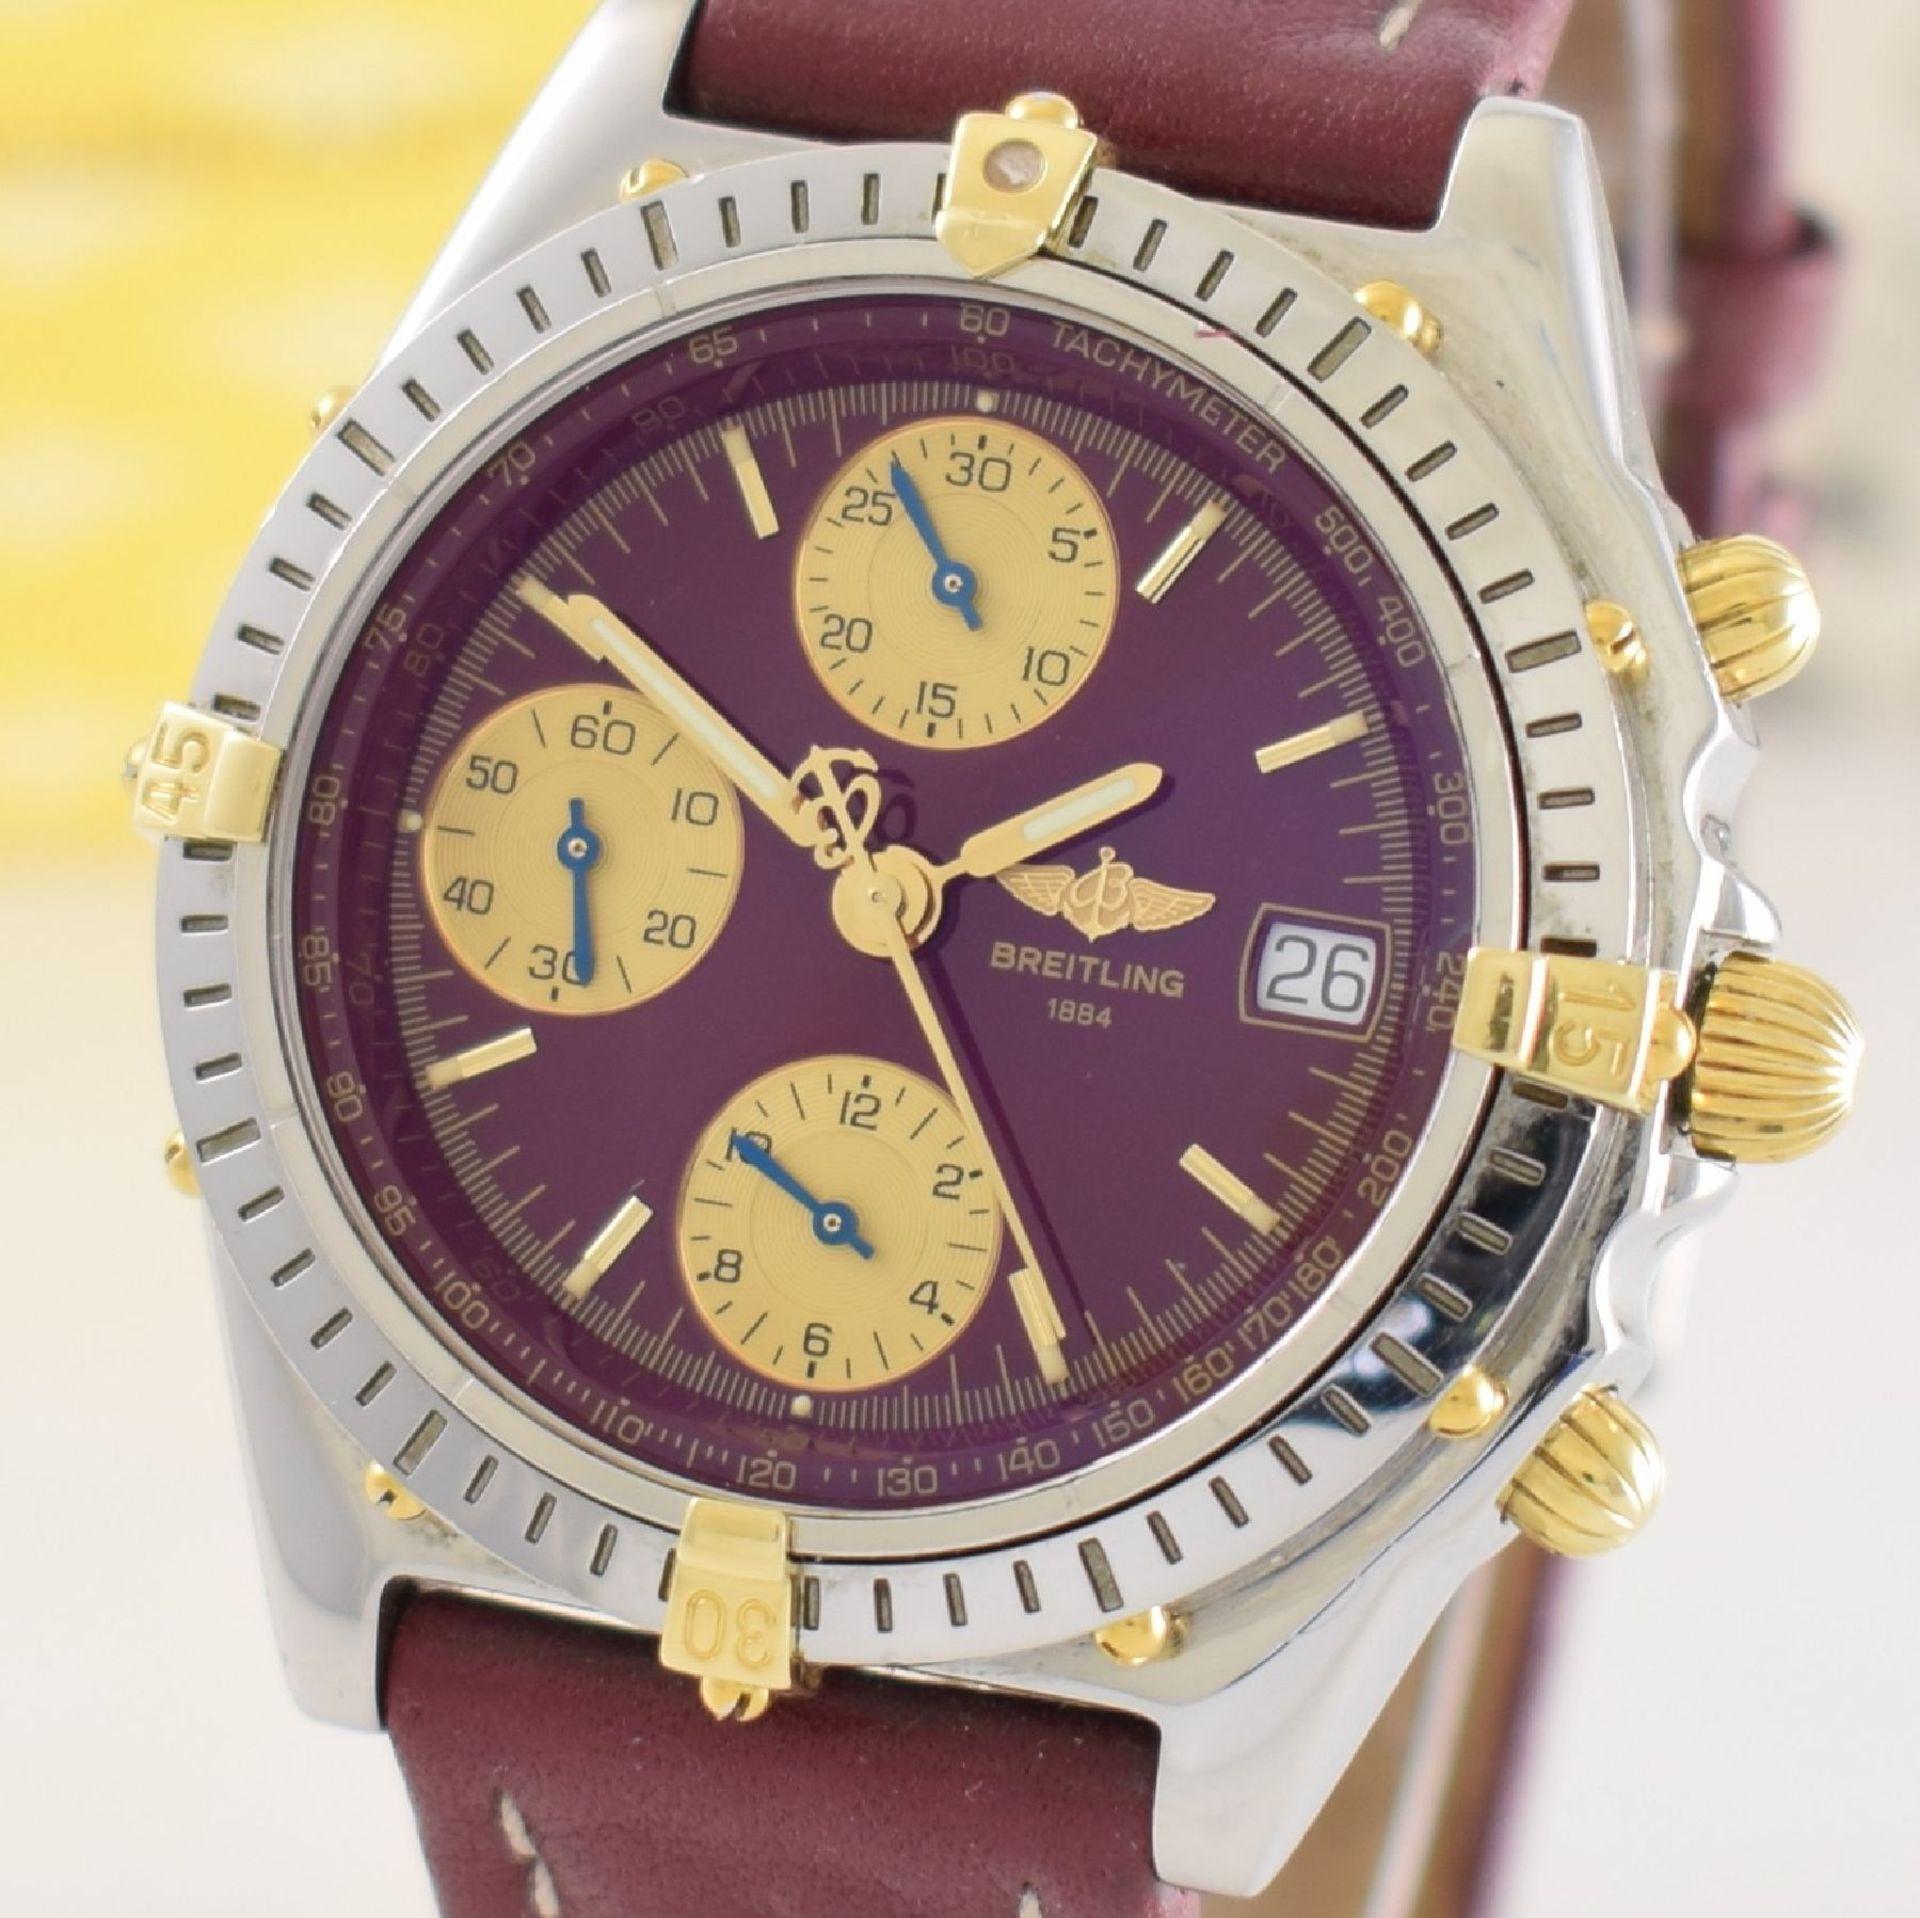 BREITLING Chronomat Herrenarmbanduhr mit Chronograph, Schweiz verk. lt. beil orig. Garantiekarte - Bild 5 aus 8